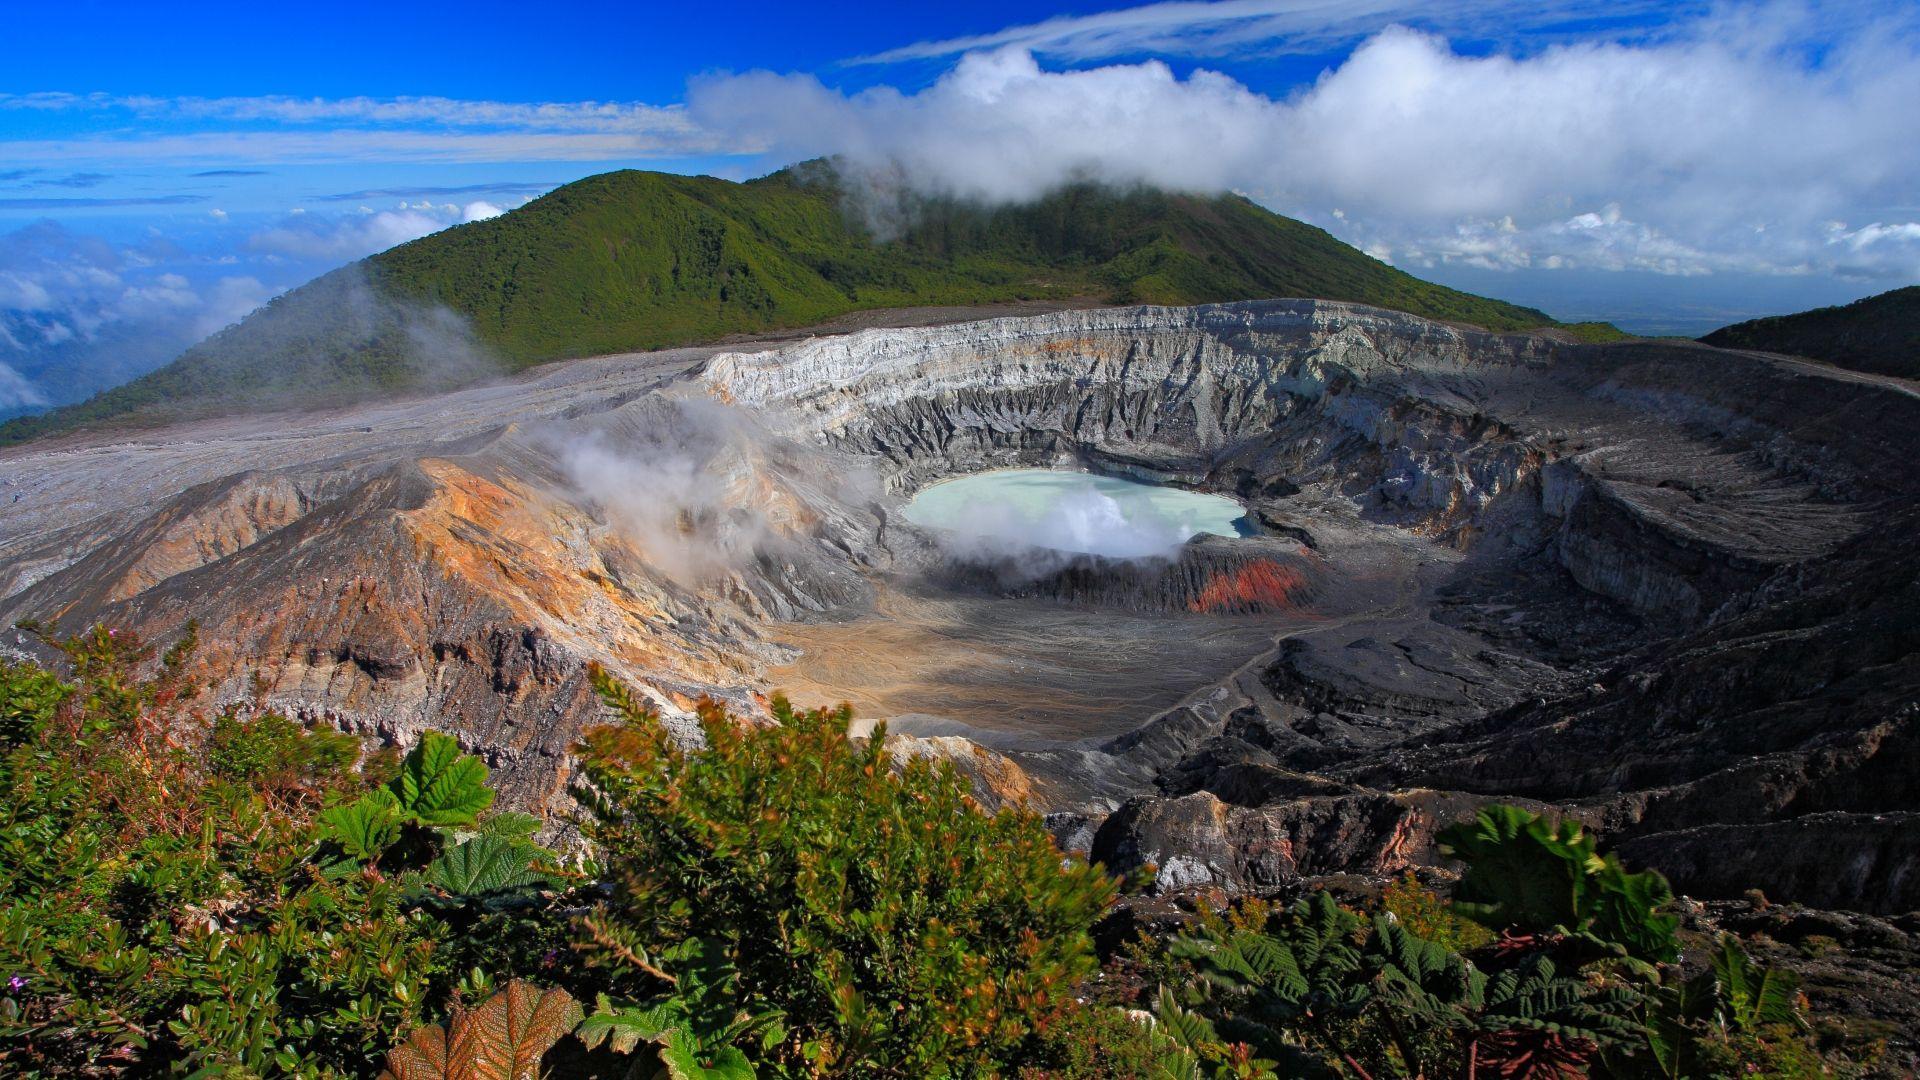 Poas ugnikalnis